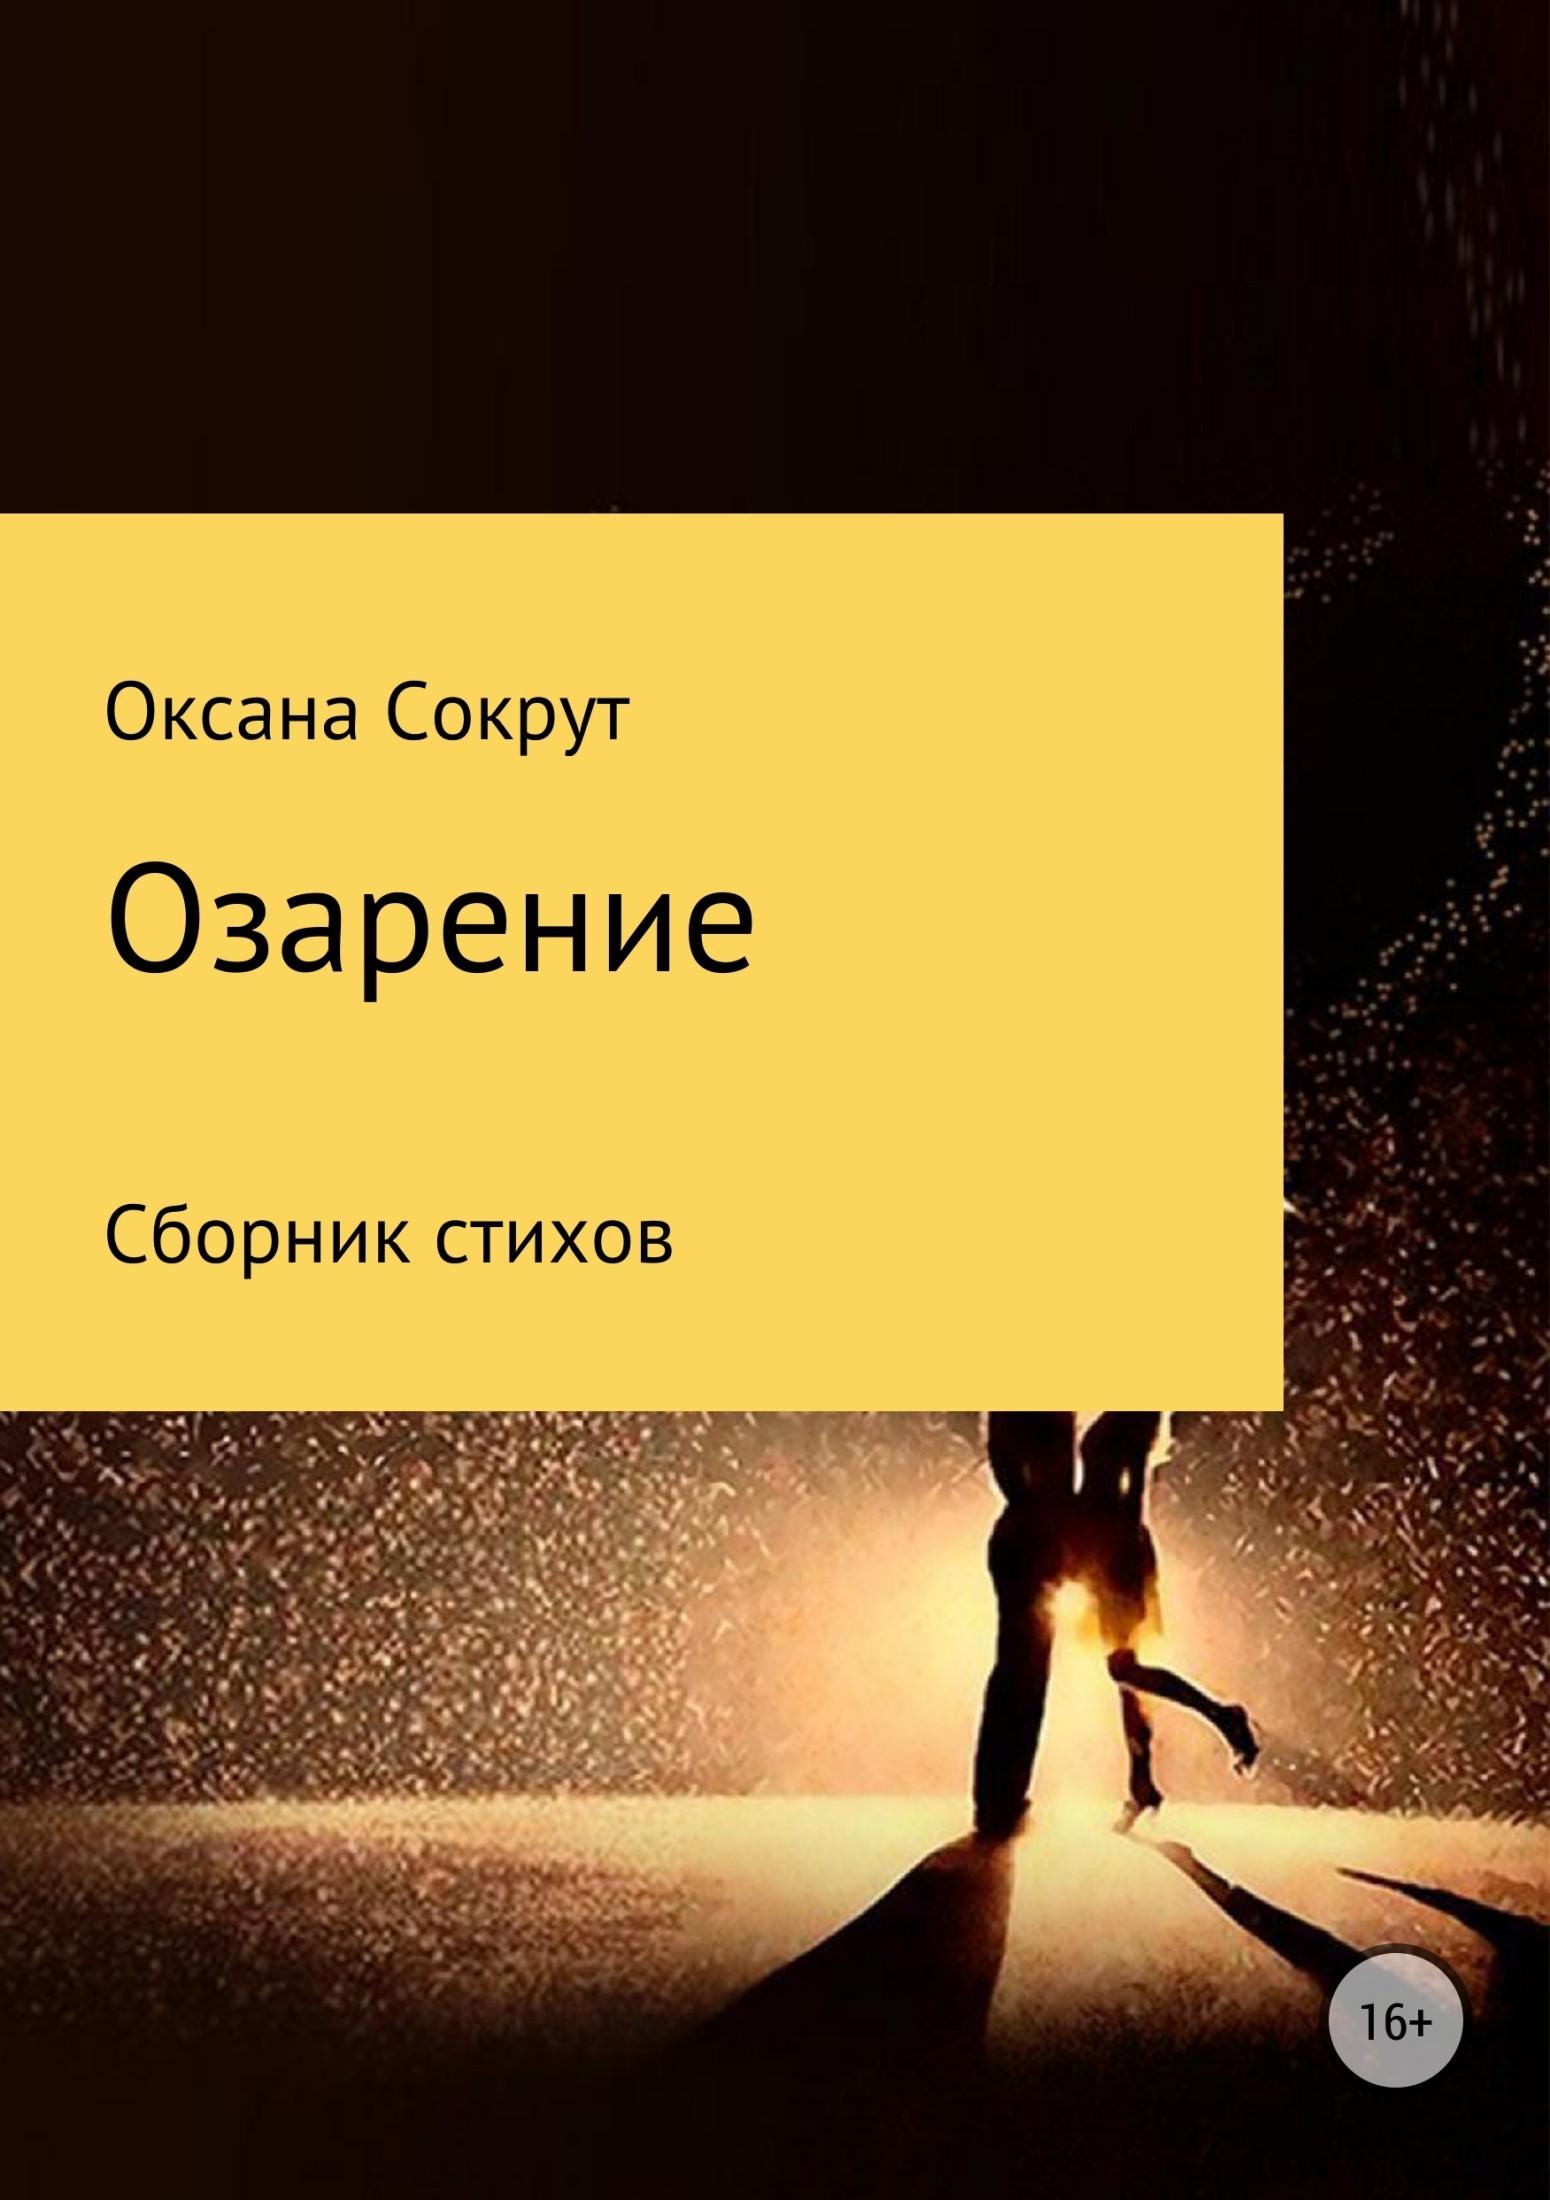 Оксана Николаевна Сокрут Озарение. Сборник стихов фату хива возврат к природе